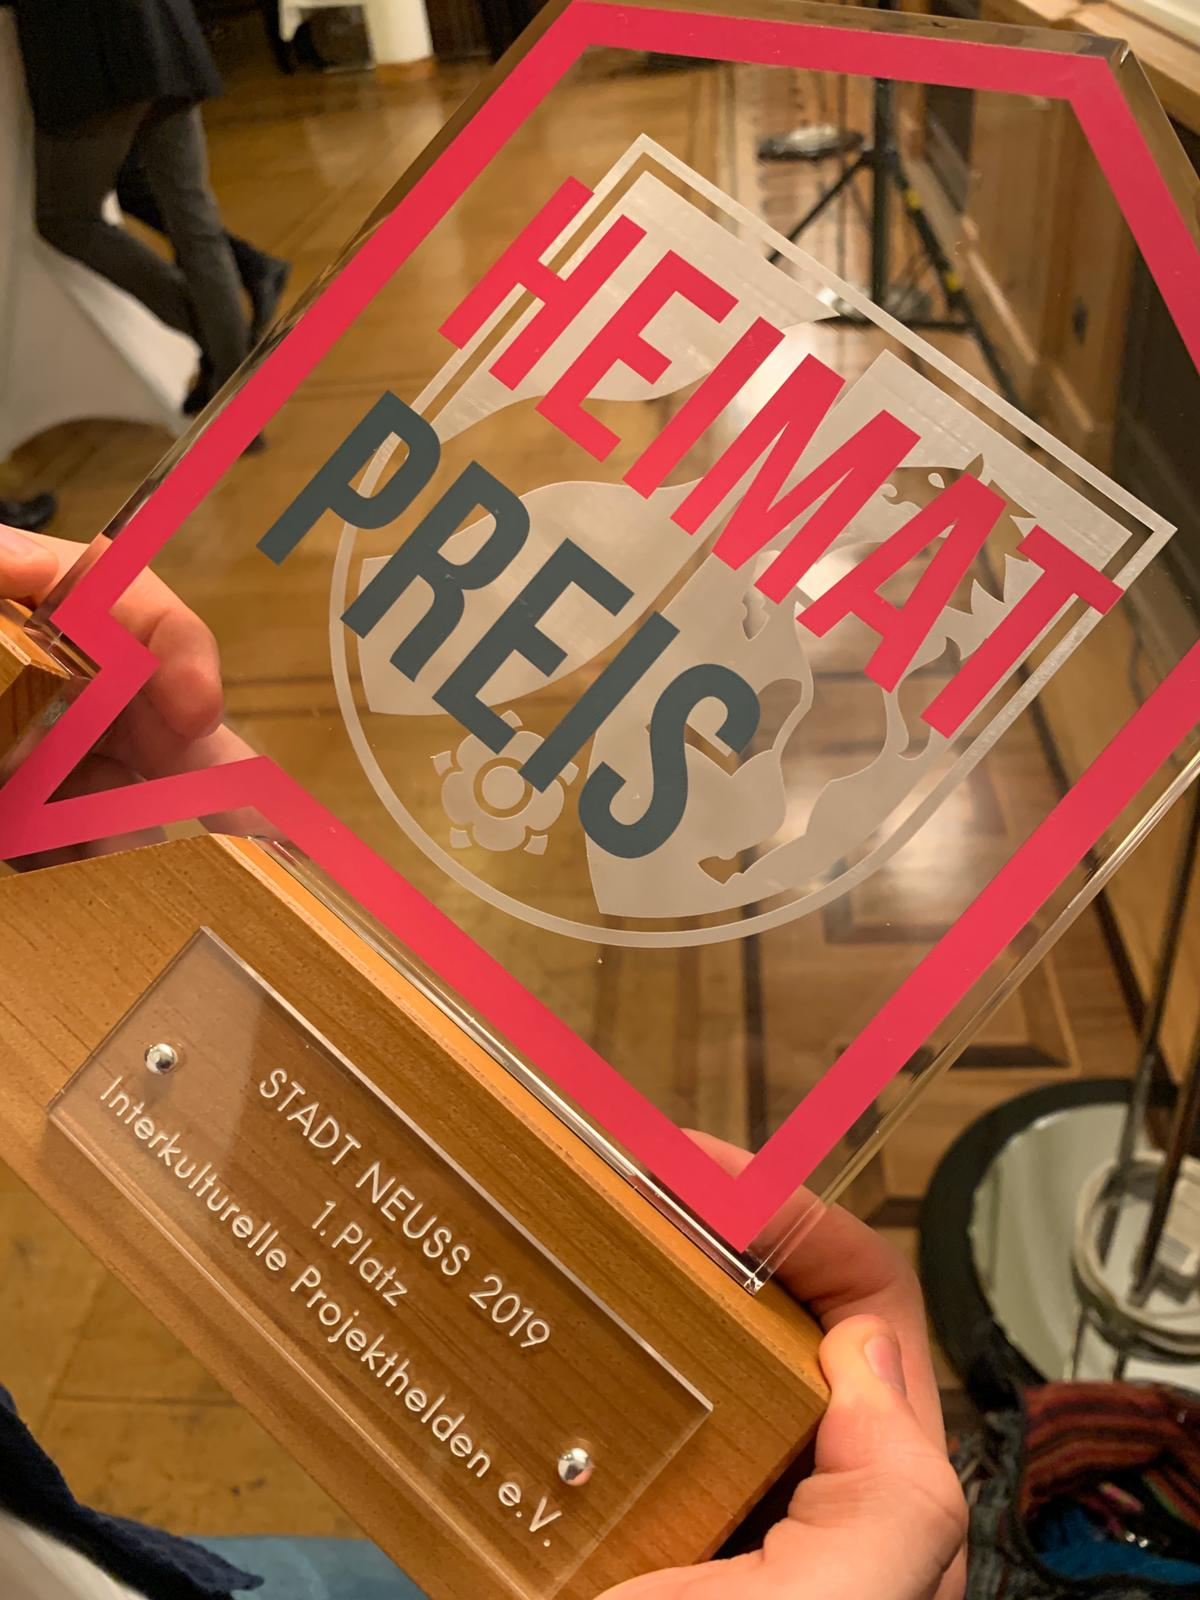 Heimatpreis Interkulturelle Projekthelden